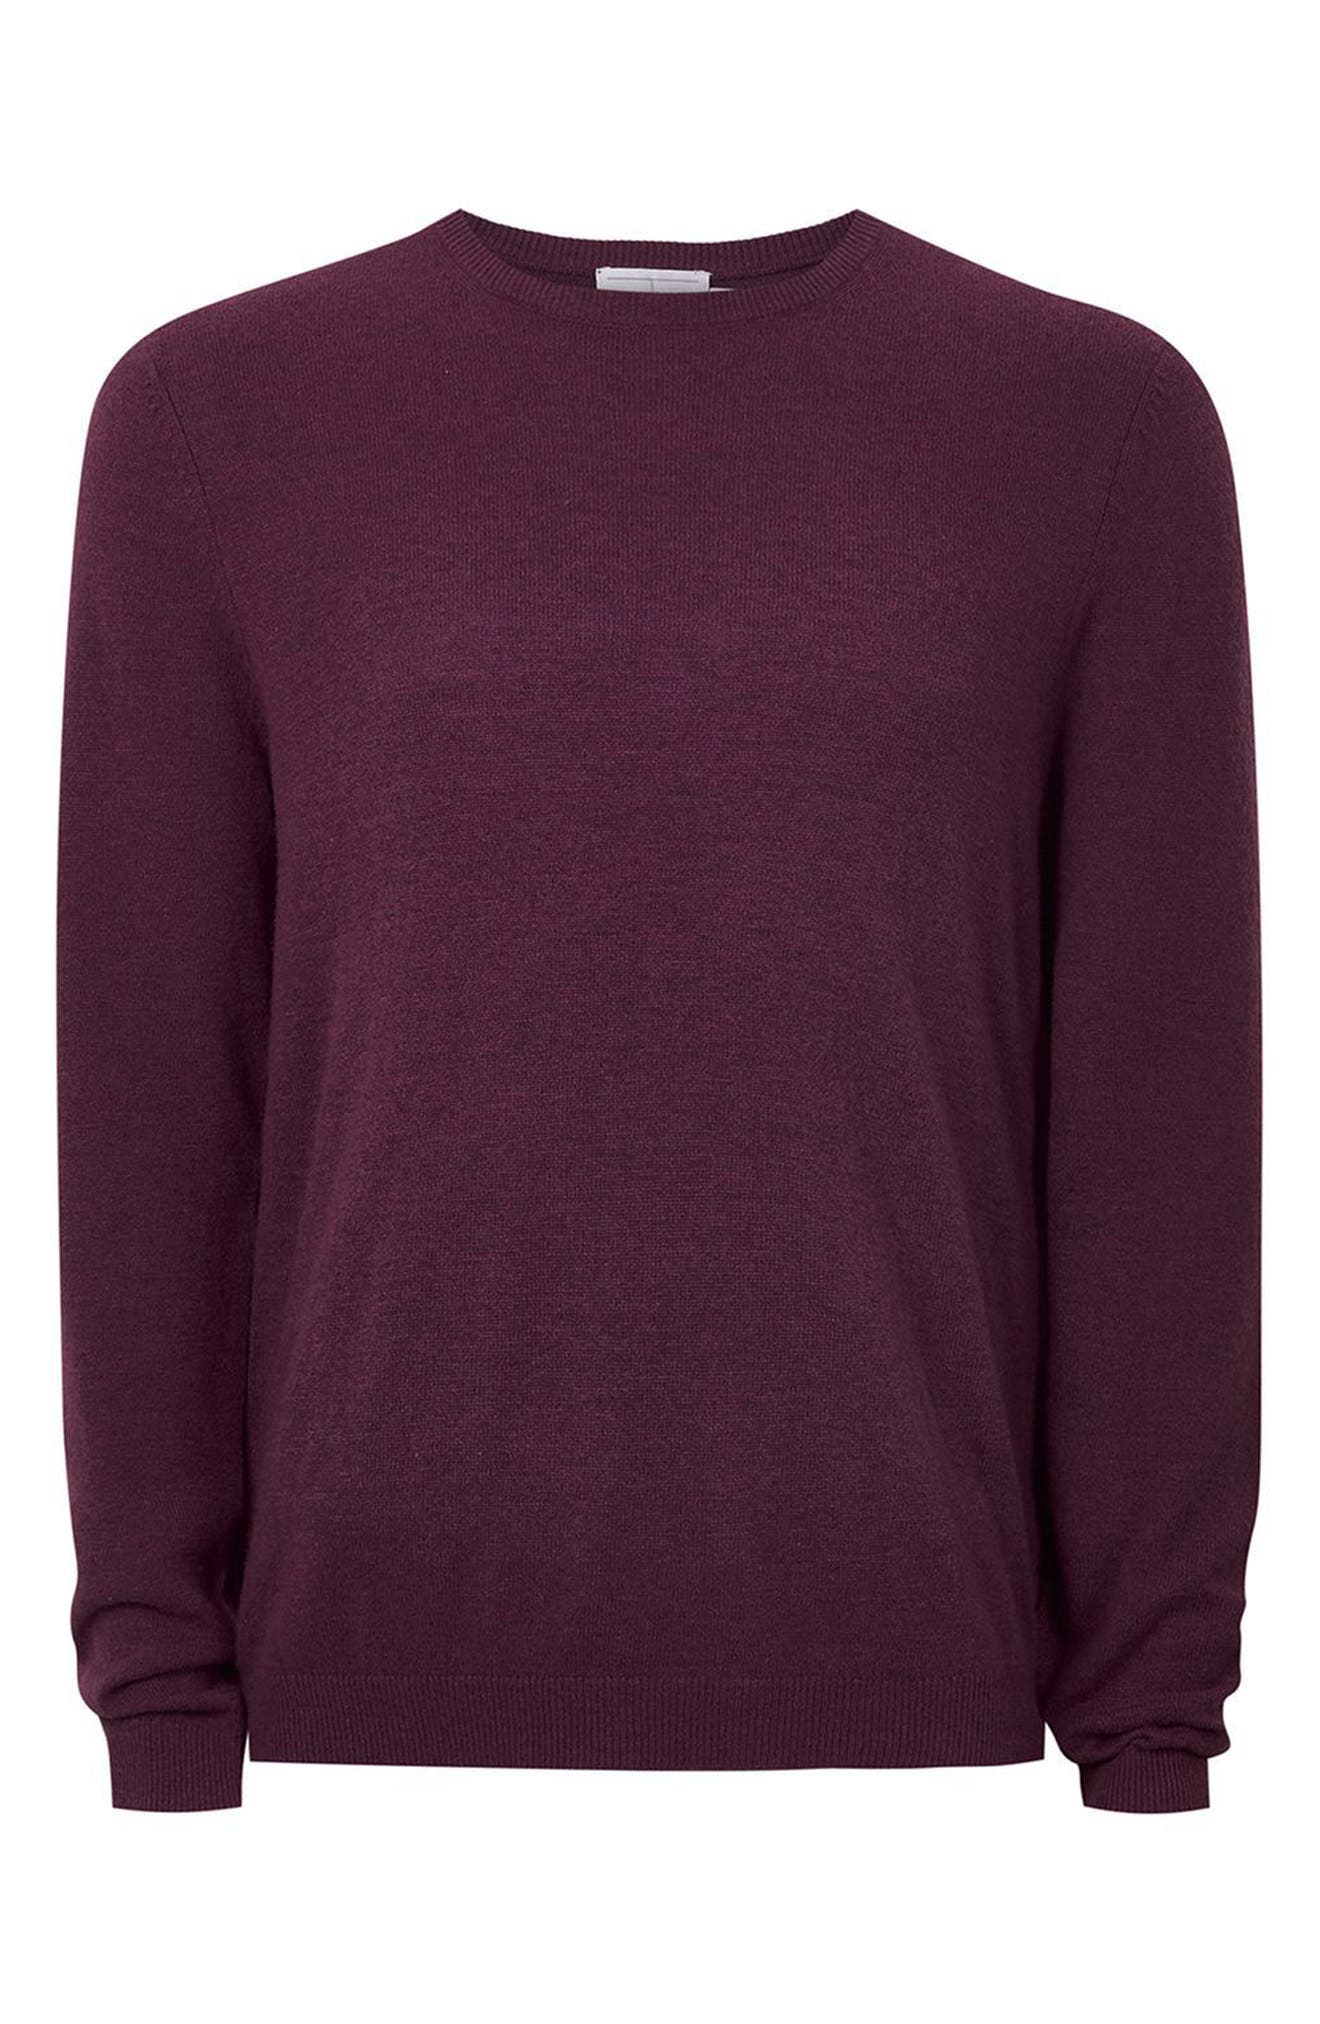 Crewneck Sweater,                             Alternate thumbnail 4, color,                             Burgundy